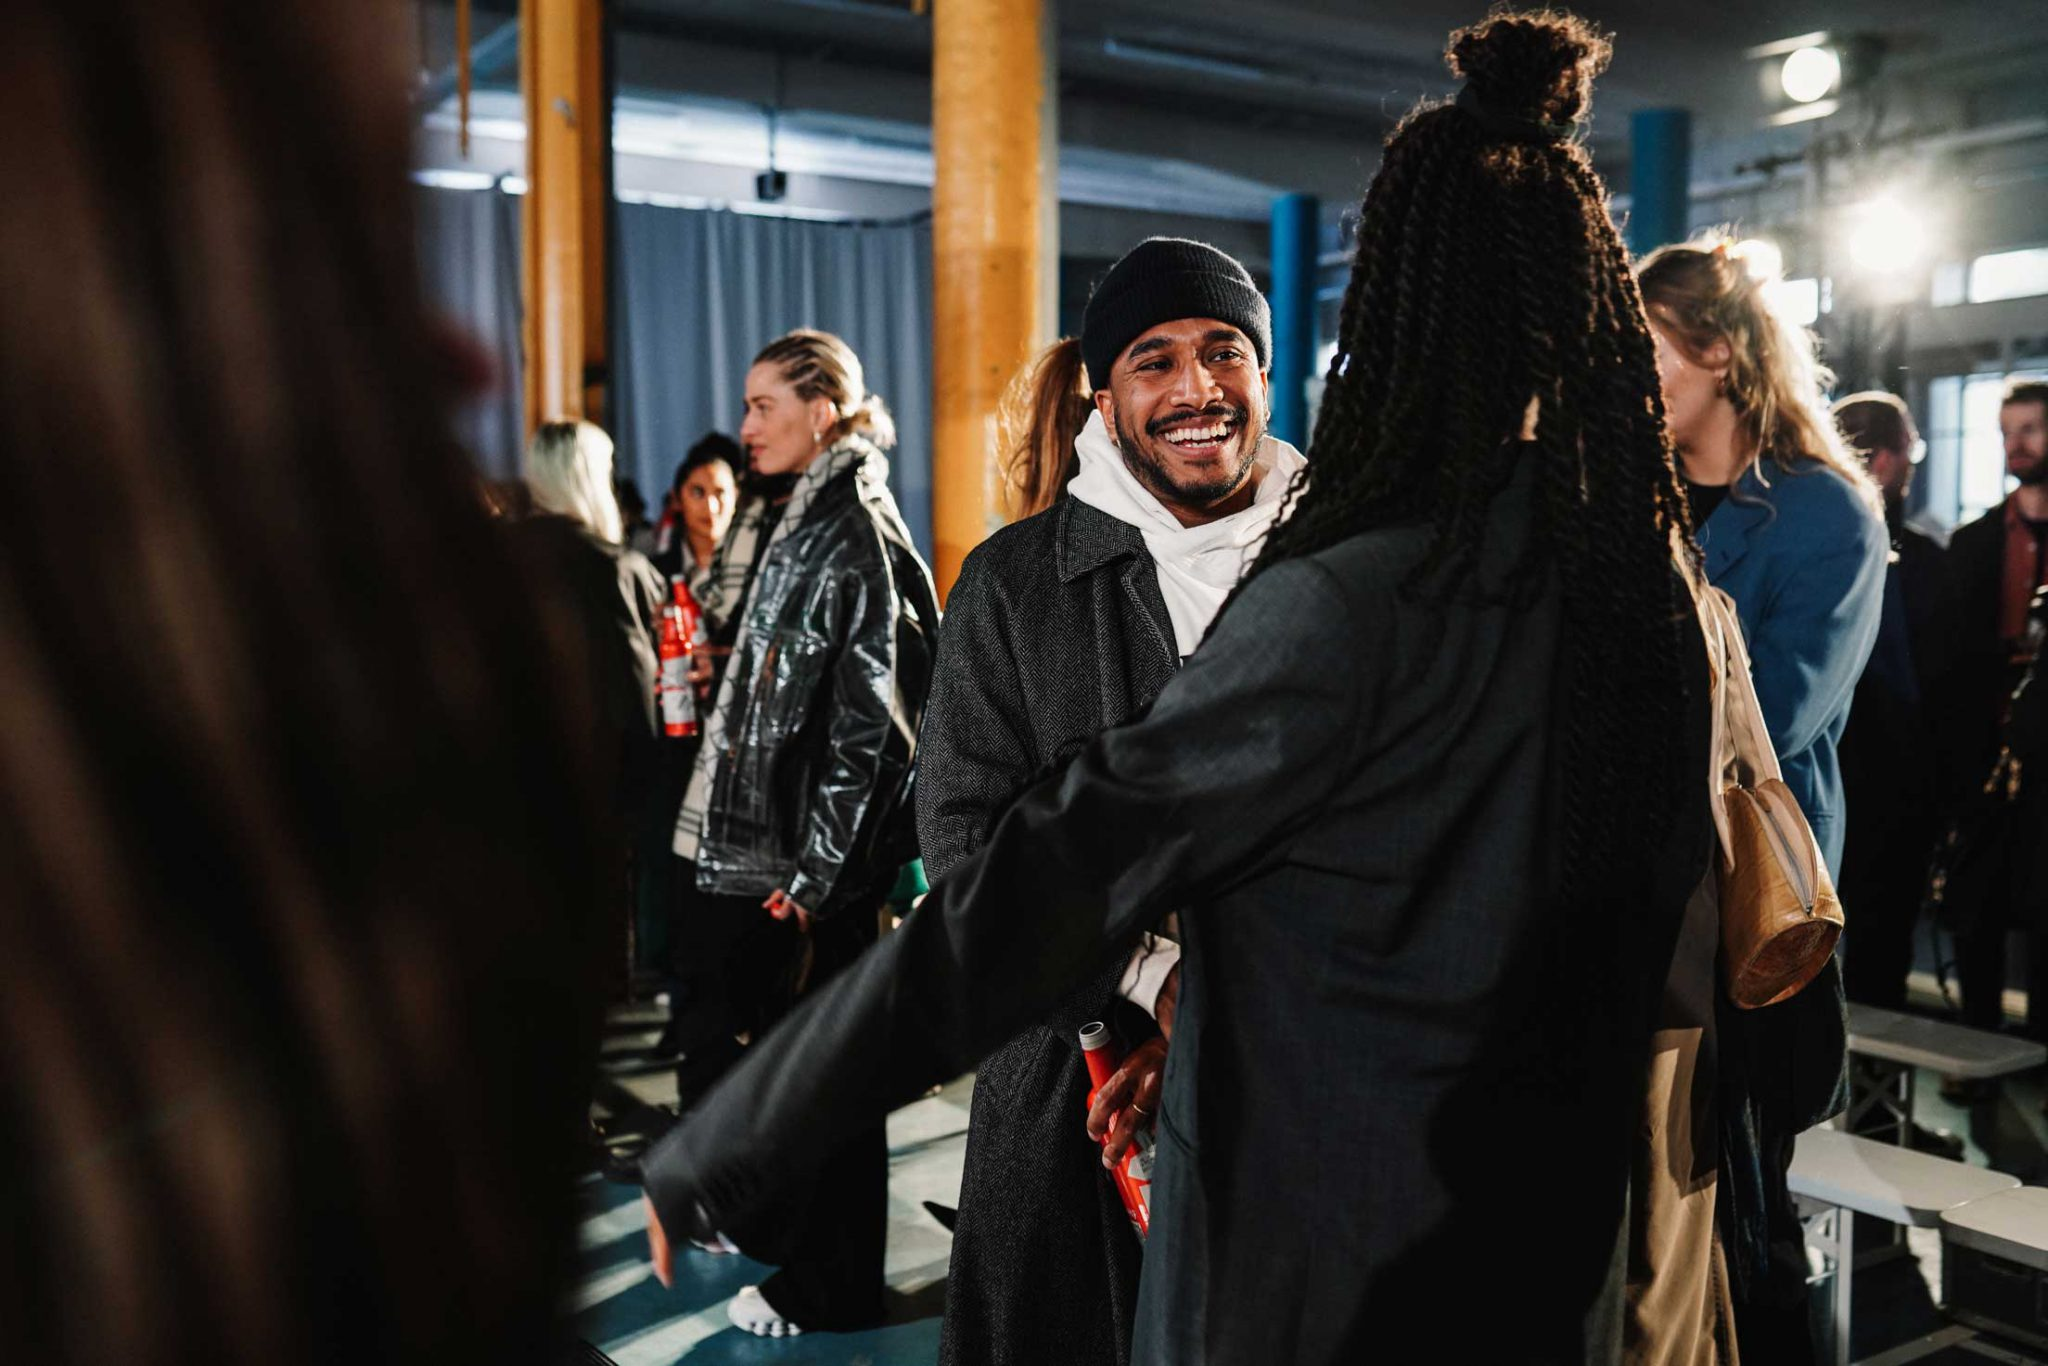 Ilsoo_van_Dijk_Ilsoovandijk_AFW_Toral_Backstage_Amsterdam_Fashion_week_2020_-scaled_17a